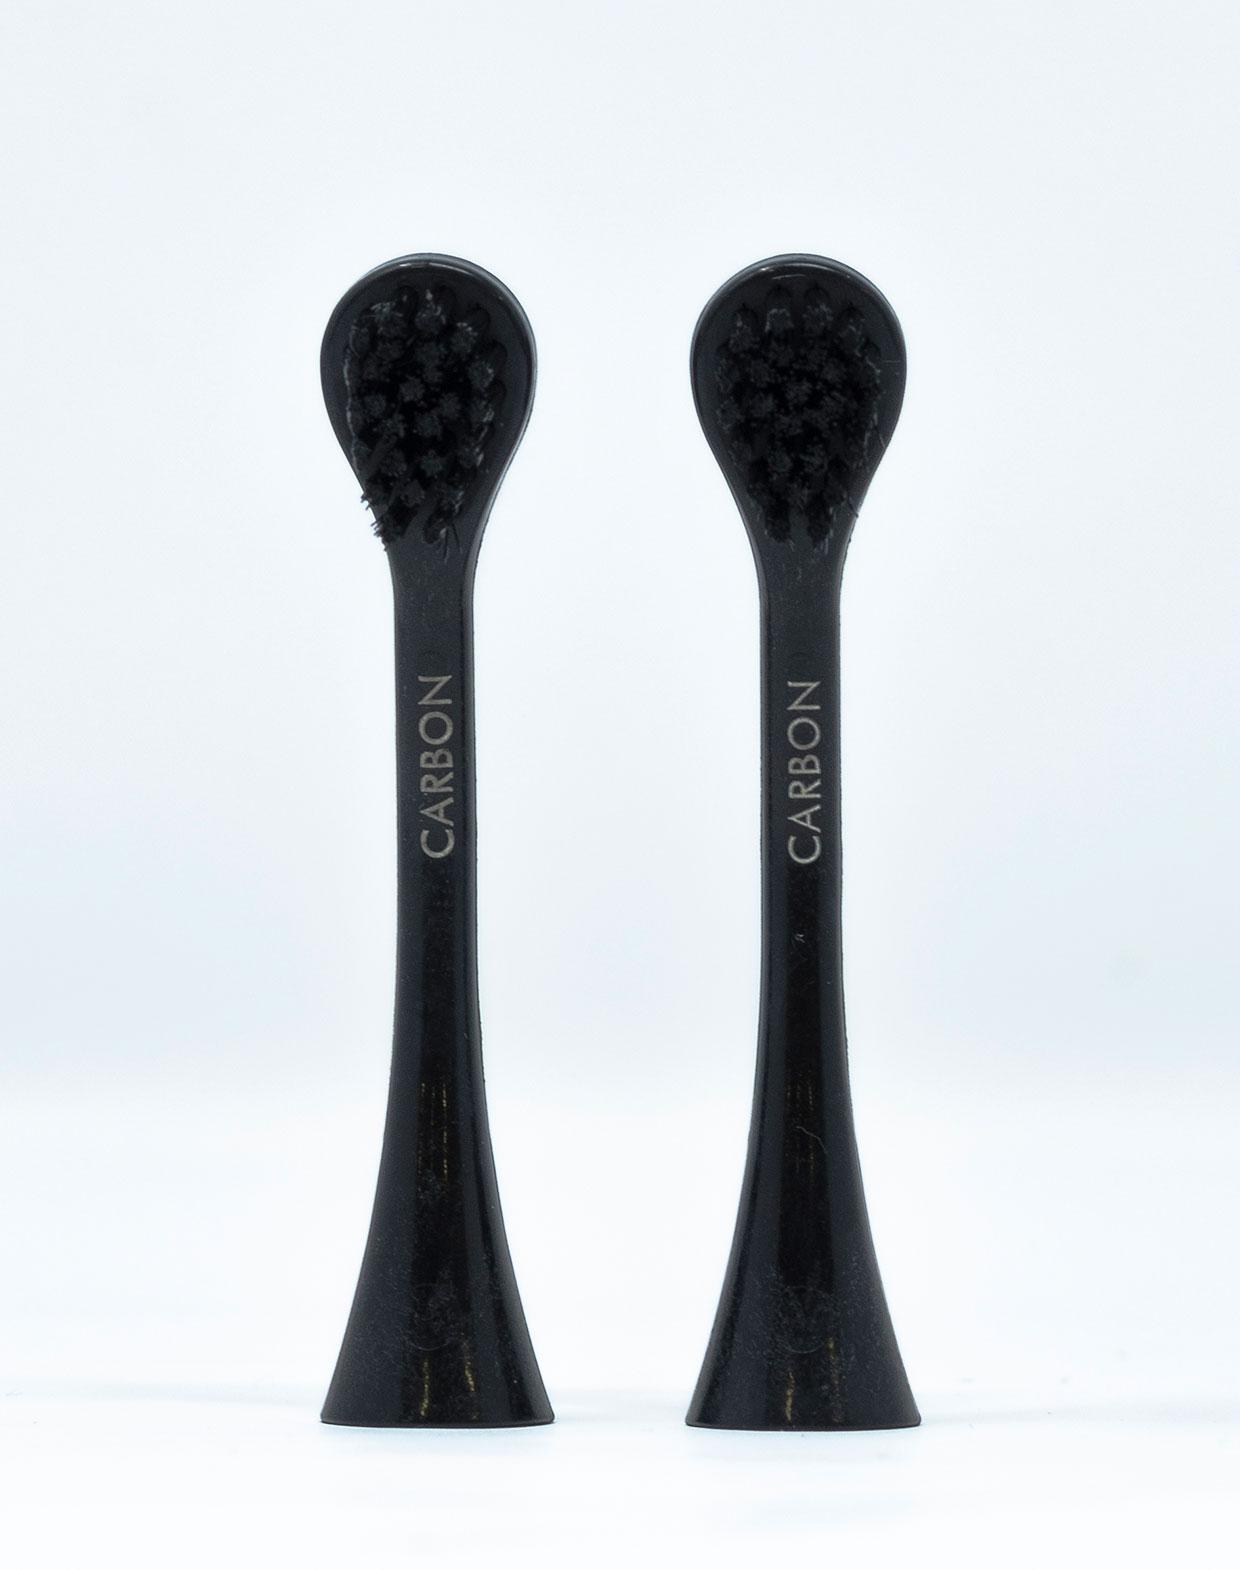 Curaprox Testina di Ricambio BIW Carbon Duo - 2 pz